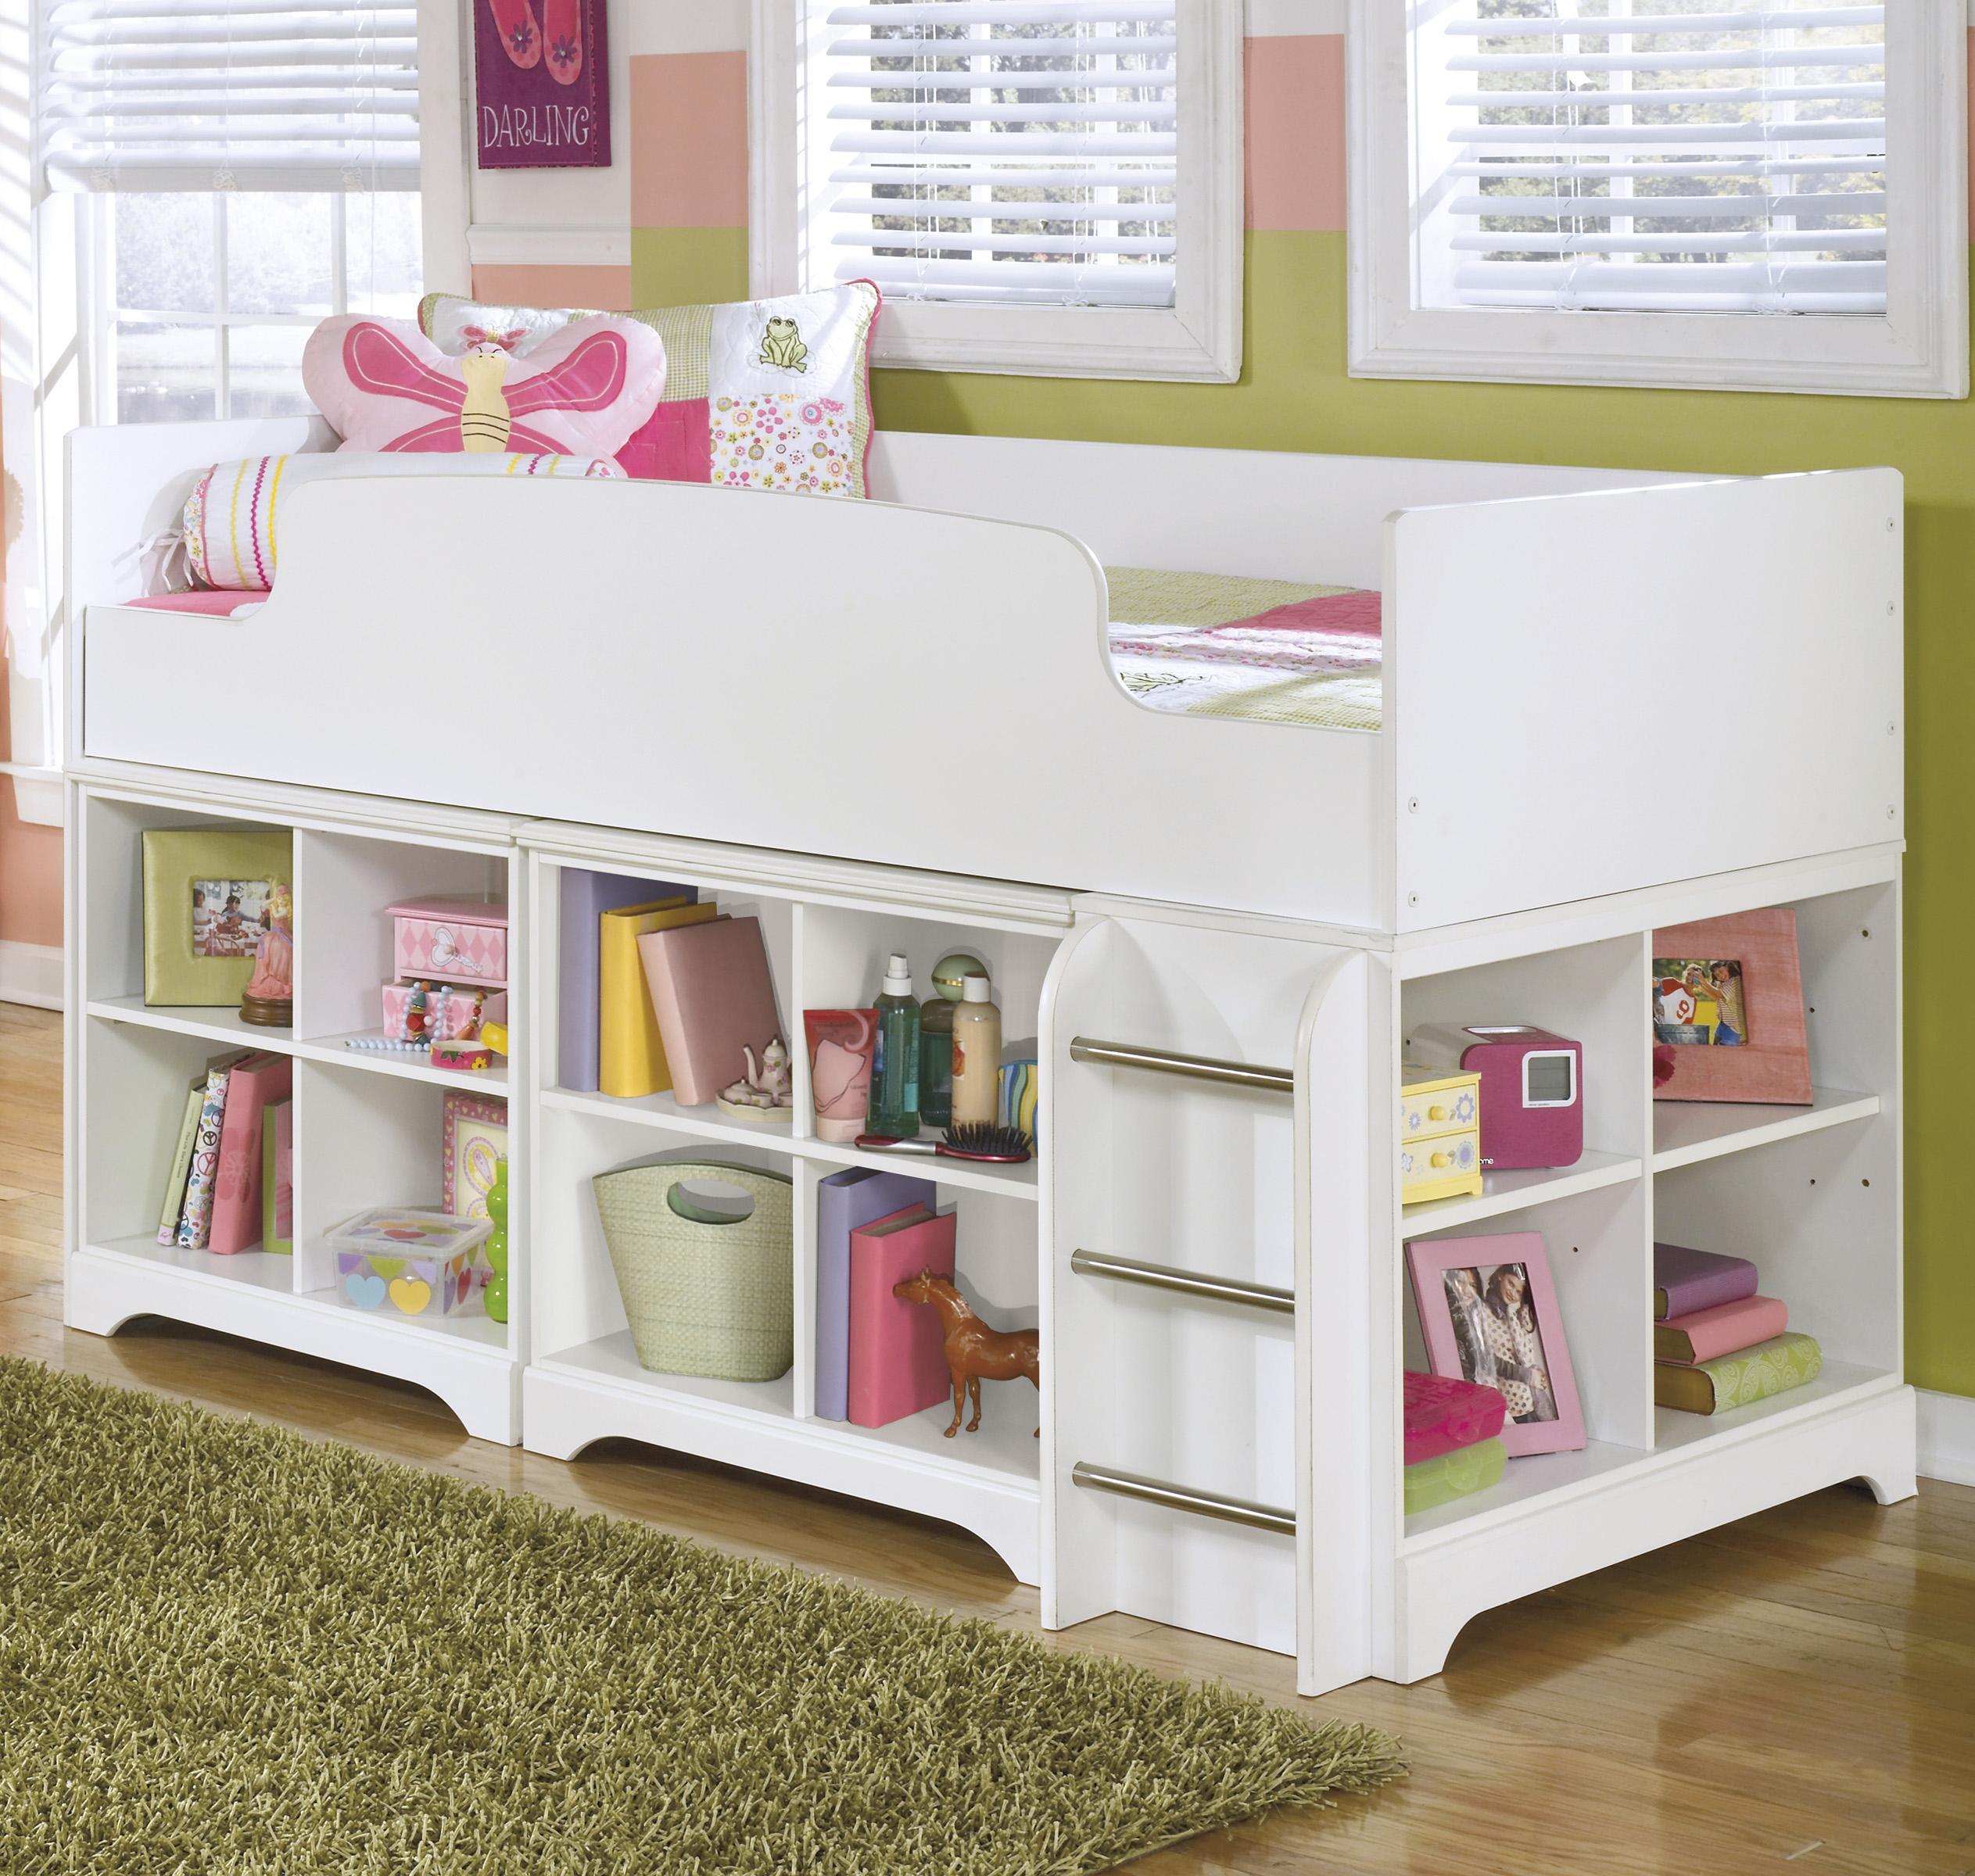 Twin Loft Bed with Loft Bin Storage